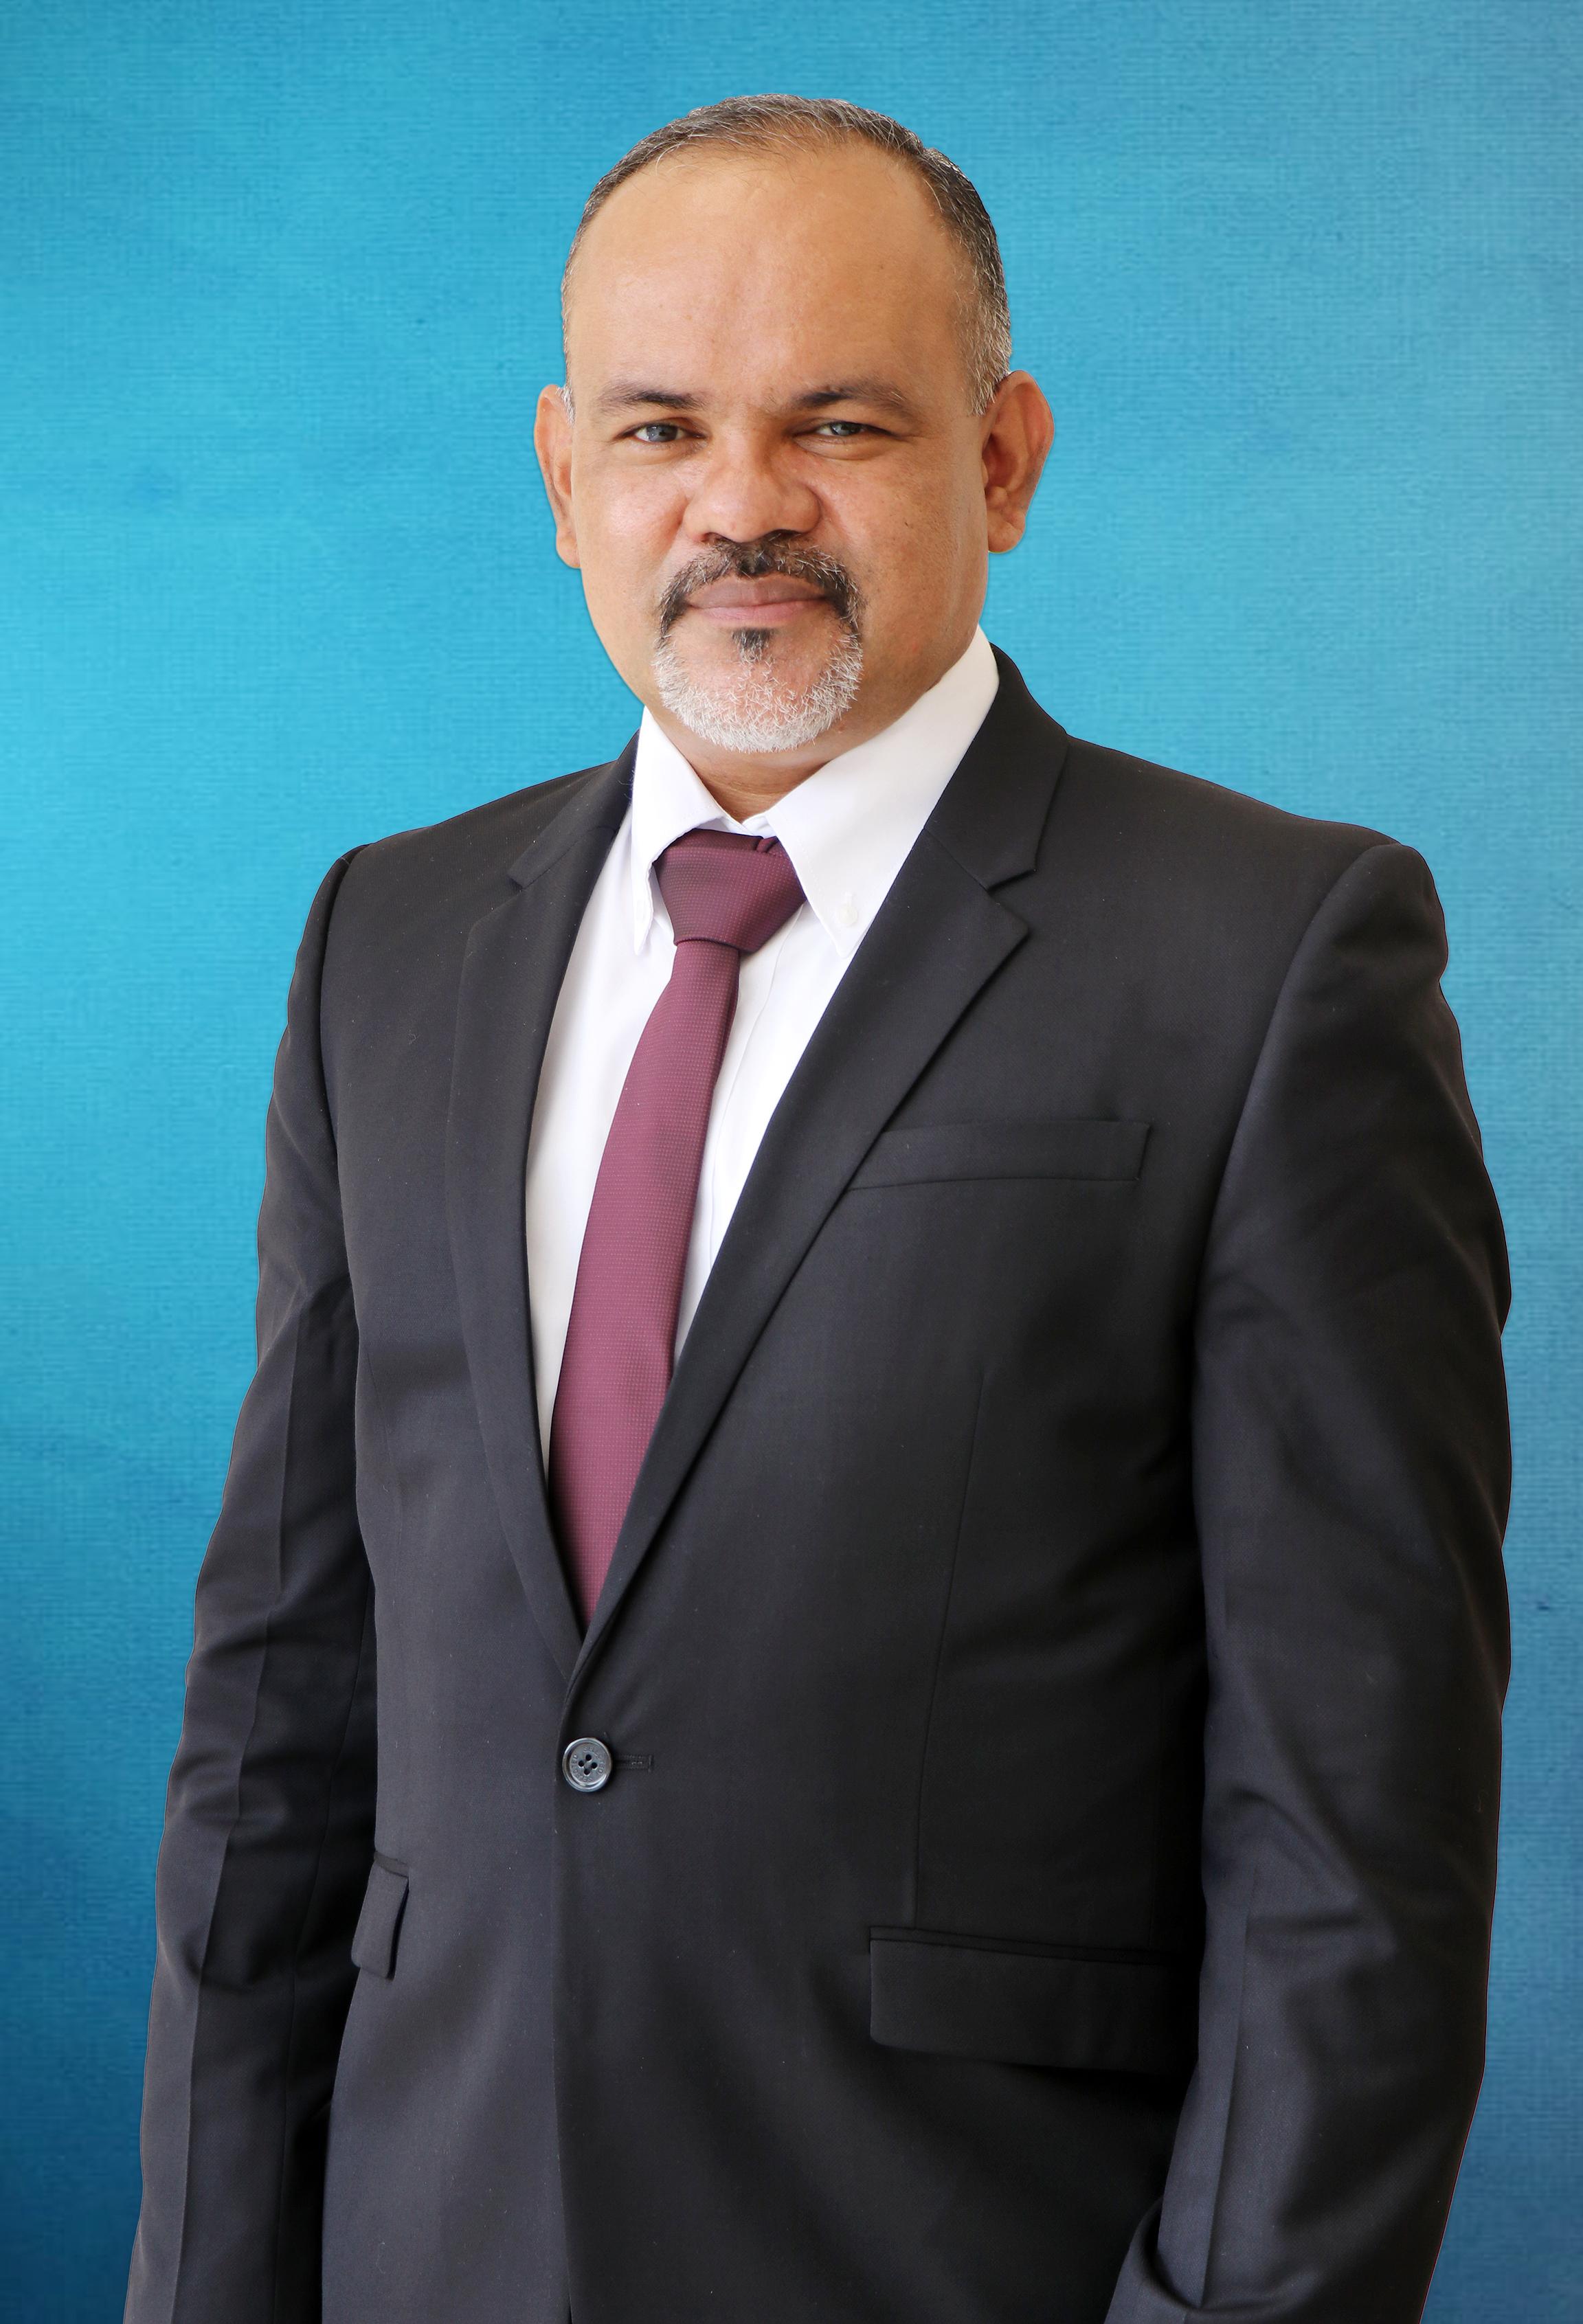 Magíster Estanislao Araúz Mela